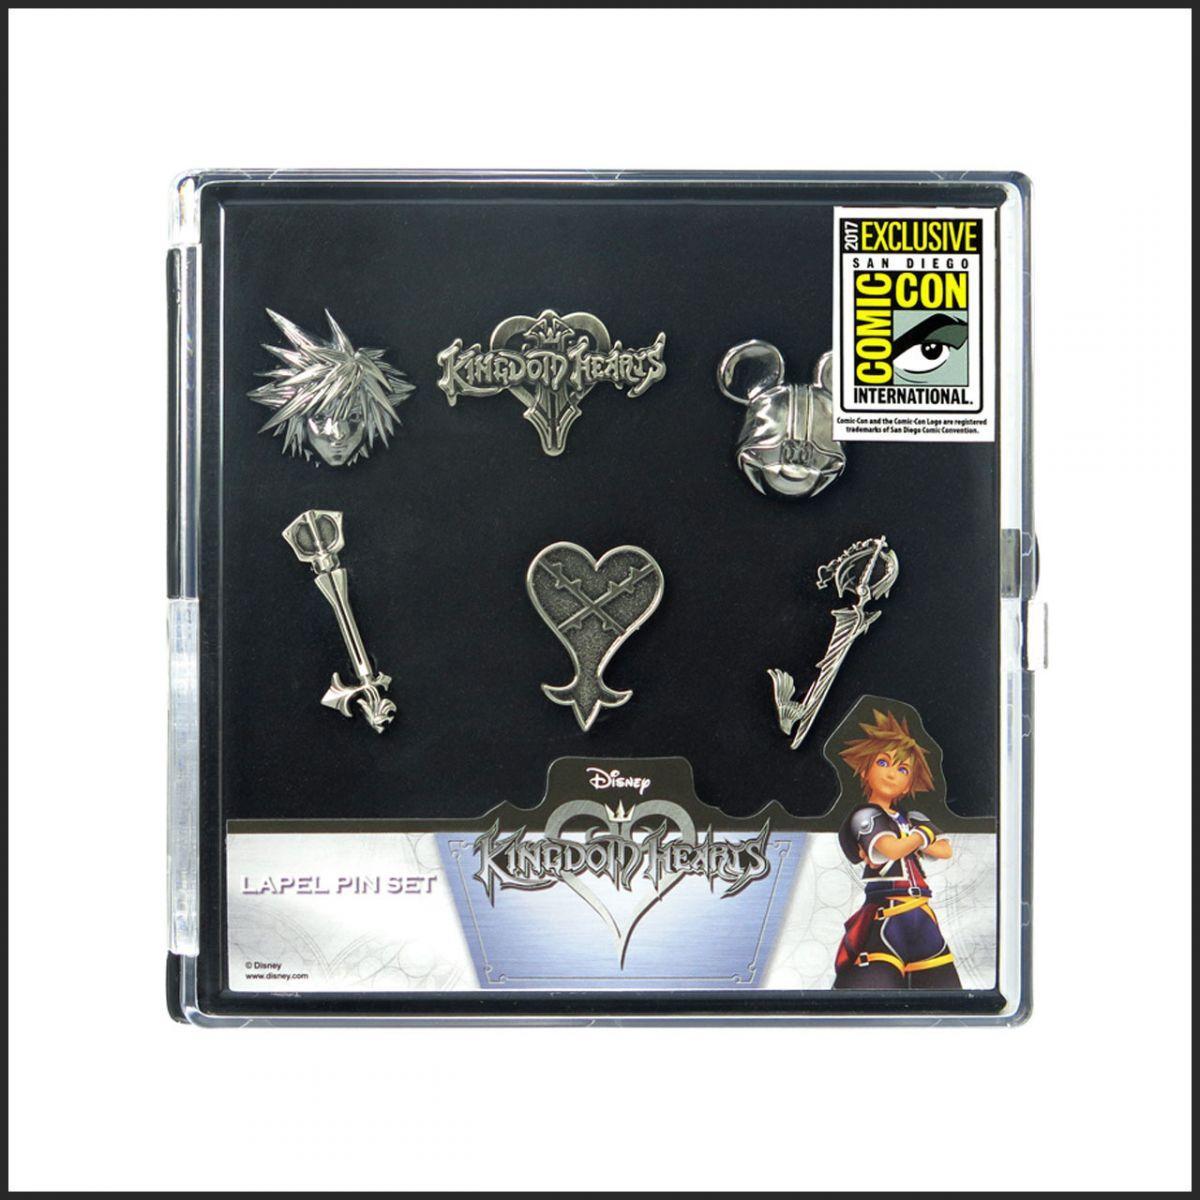 2017 San Diego Comic Con Exclusive - Kingdom Hearts Pewter Lapel Pins - 6 pc Set